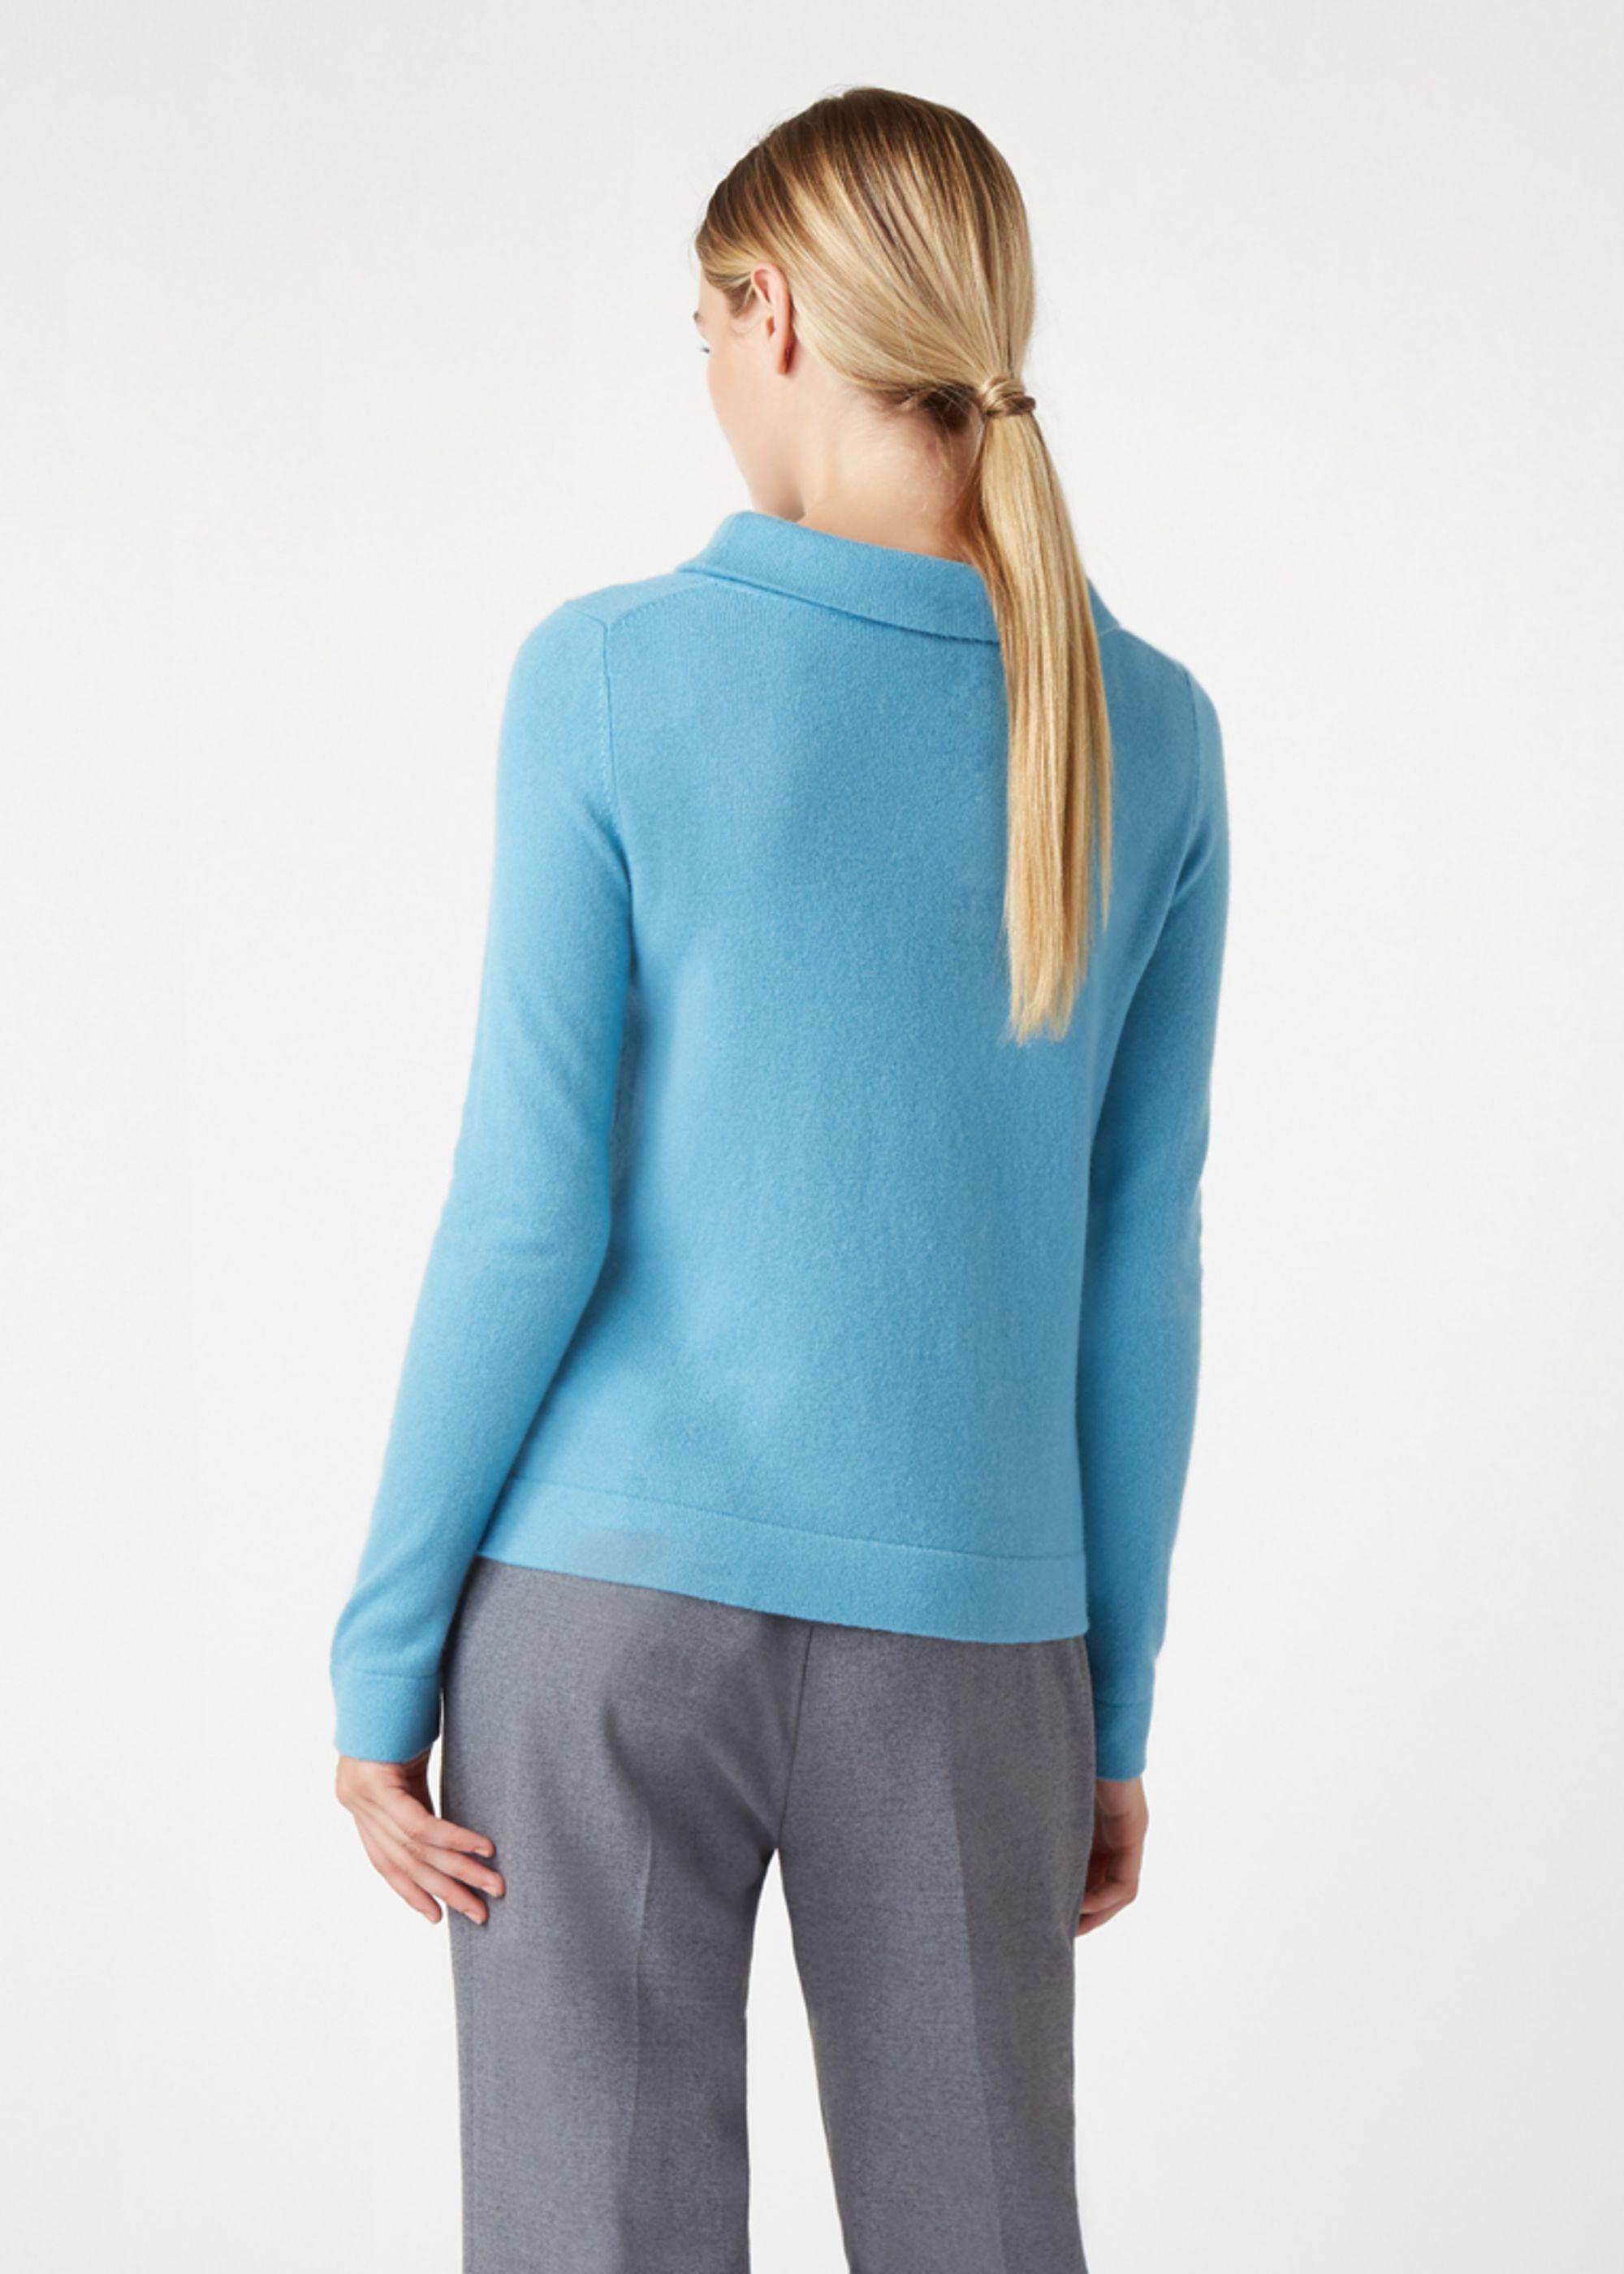 HOBBS Ladies Audrey Light Blue Wool Cashmere Roll Neck Jumper XL BNWT RRP85